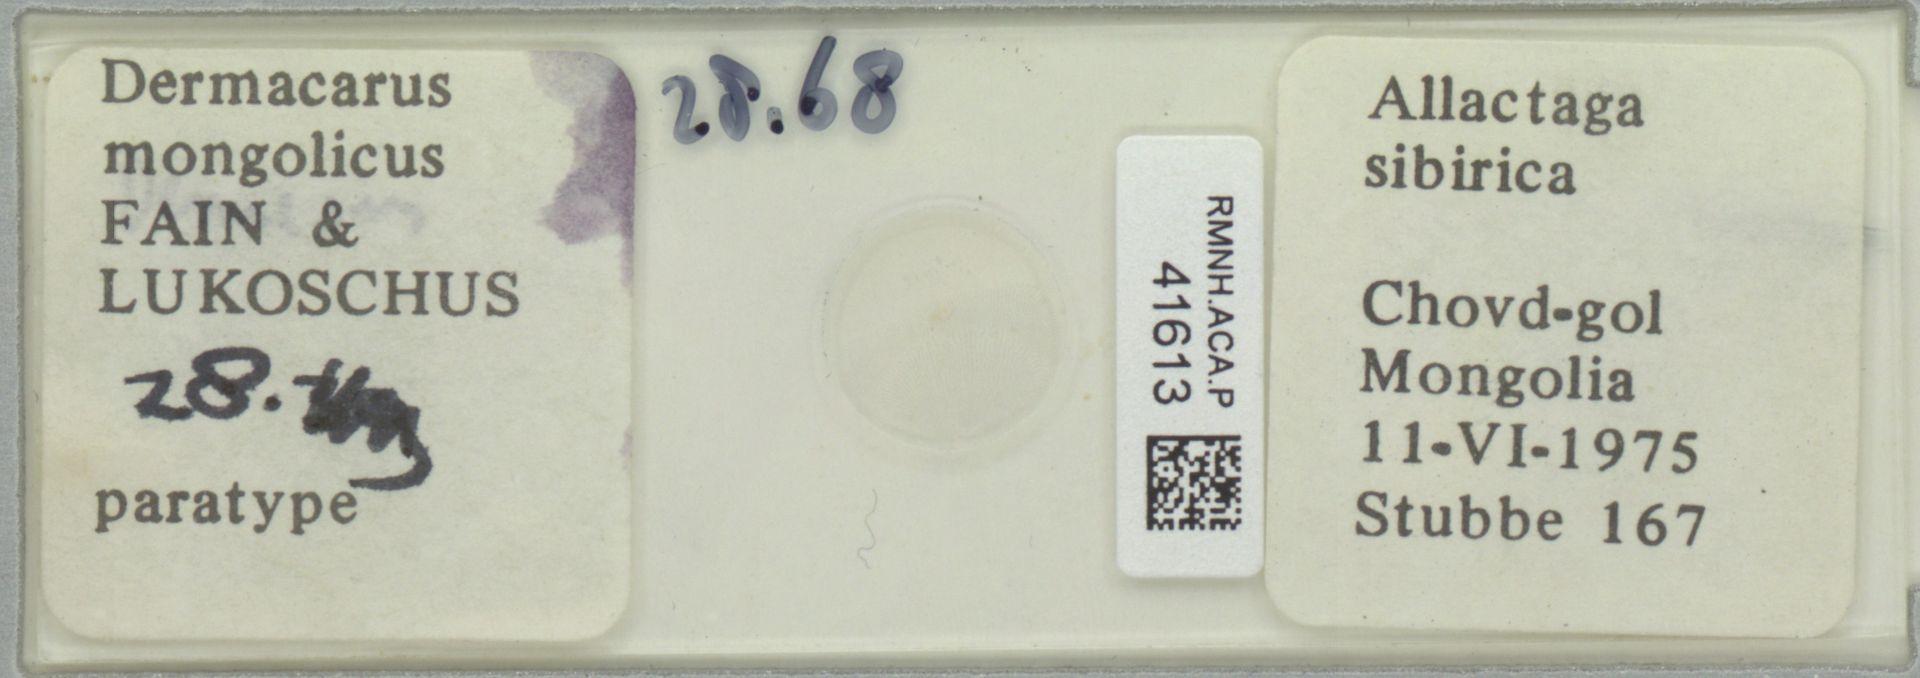 RMNH.ACA.P.41613 | Dermacarus mongolicus Fain & Lukoschus